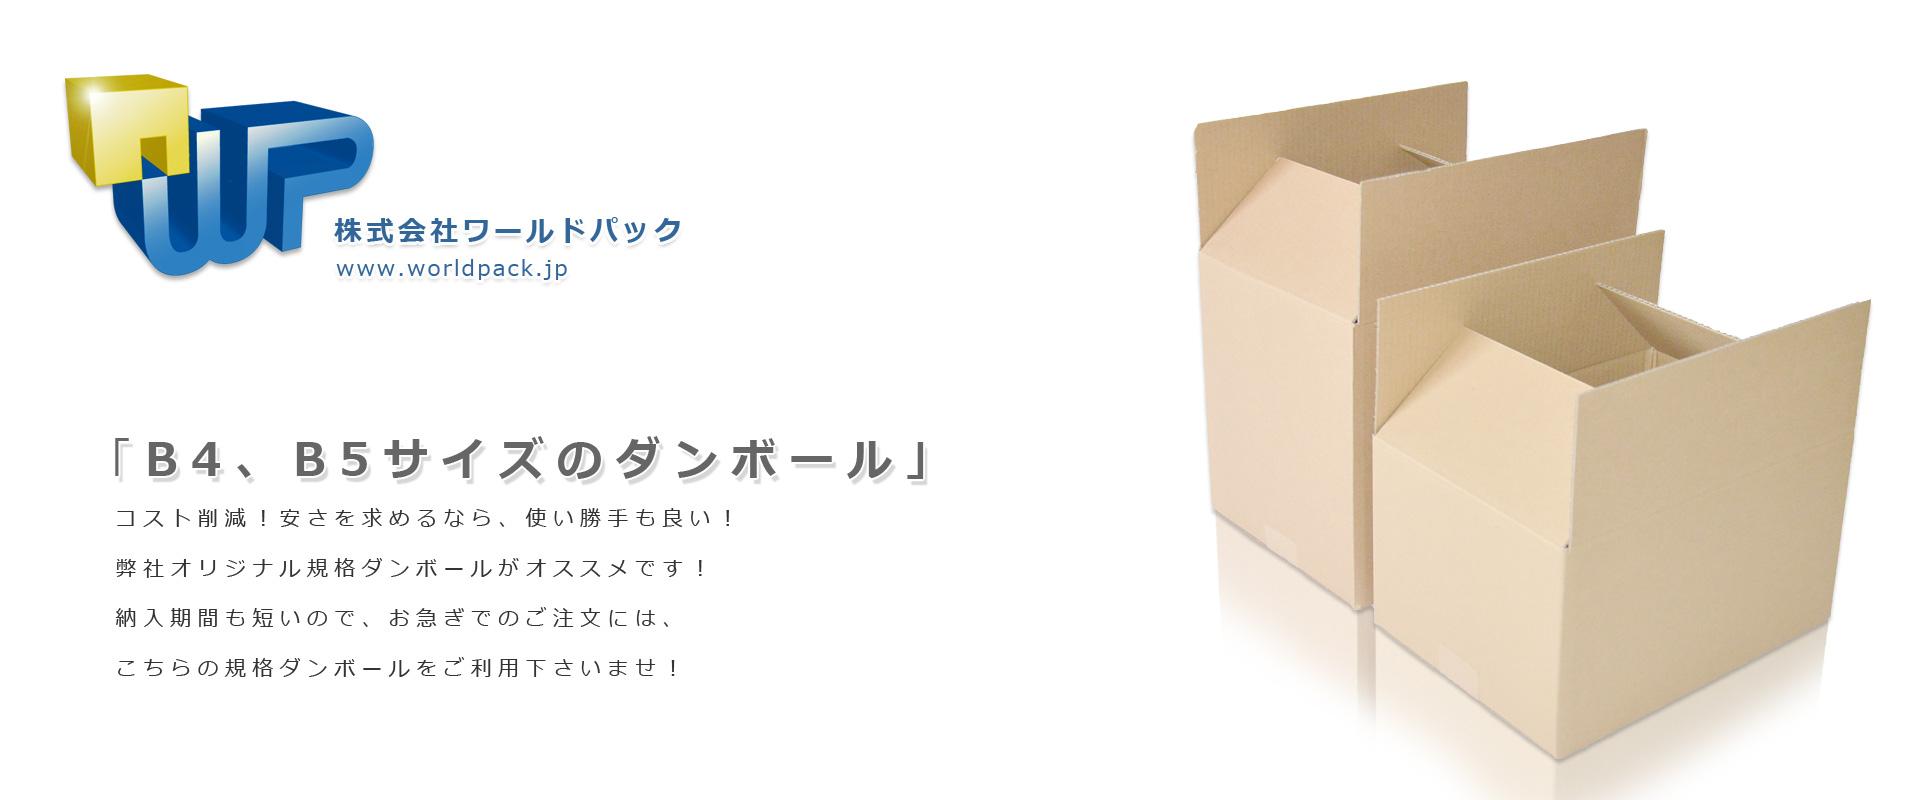 B5,B4サイズの規格ダンボール 小ロット販売OK 株式会社ワールドパック 東京、神奈川、埼玉、千葉、茨城、群馬、栃木